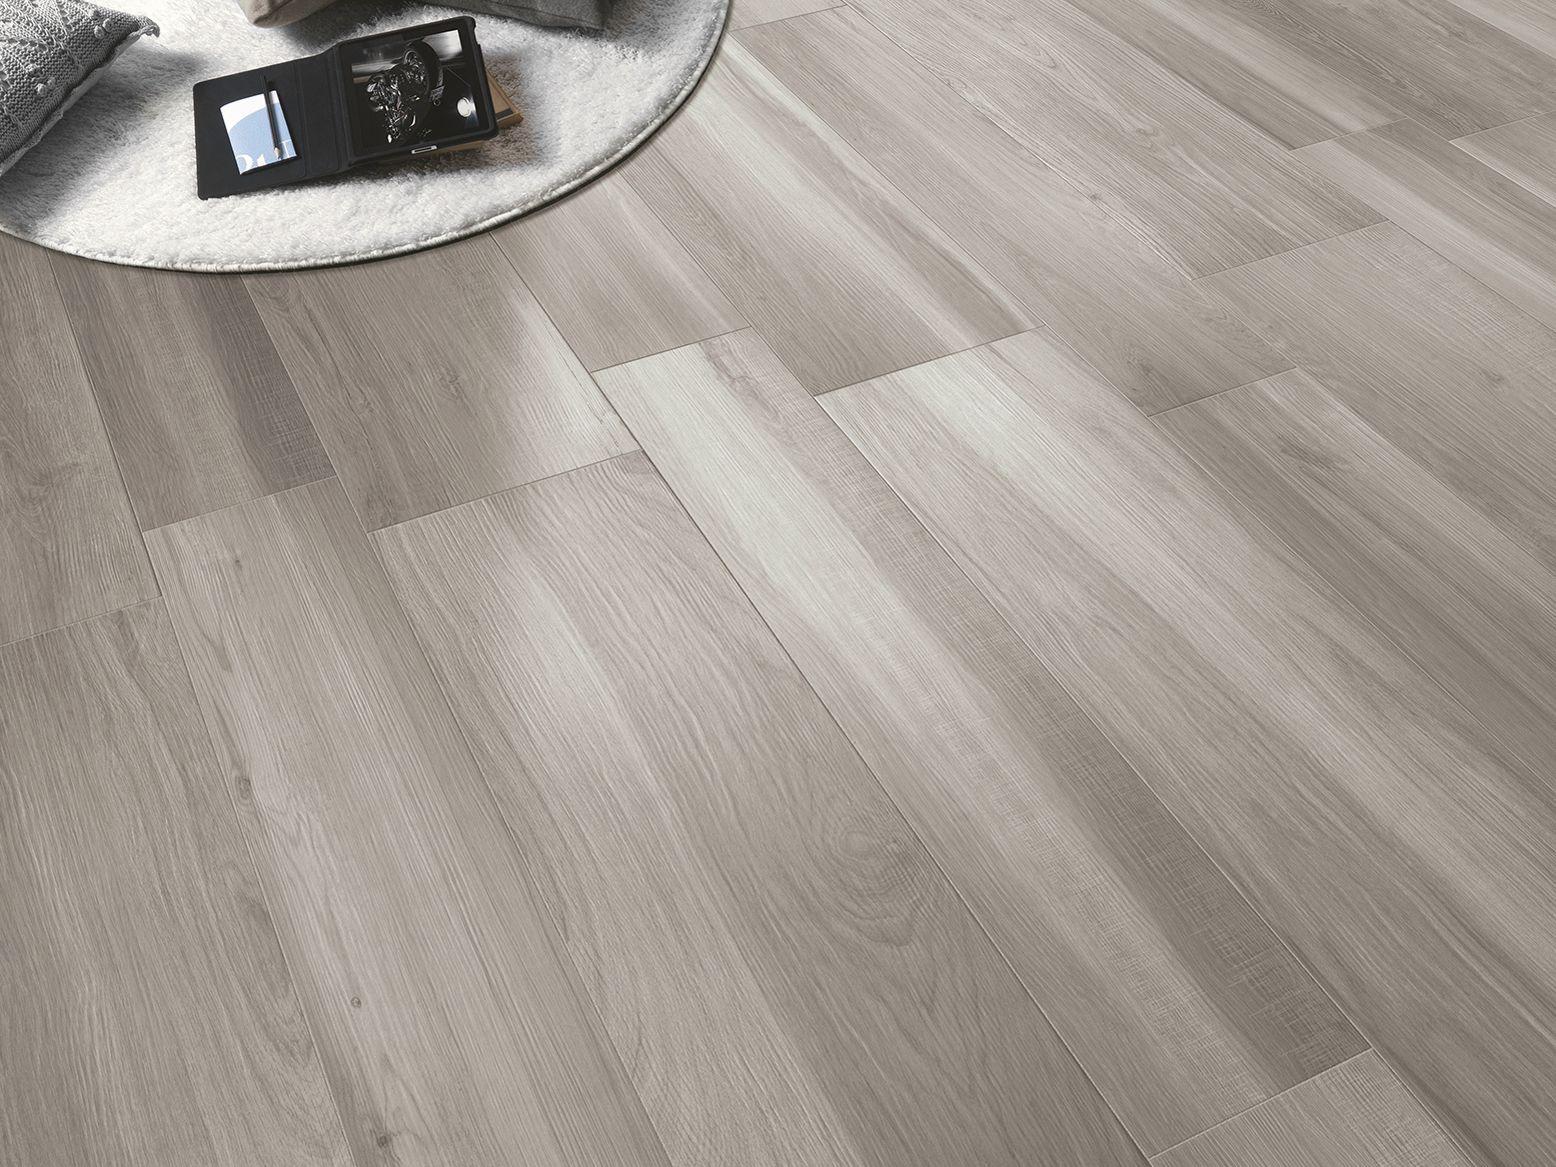 Acanto flooring by serenissima - Ceramicos imitacion madera ...